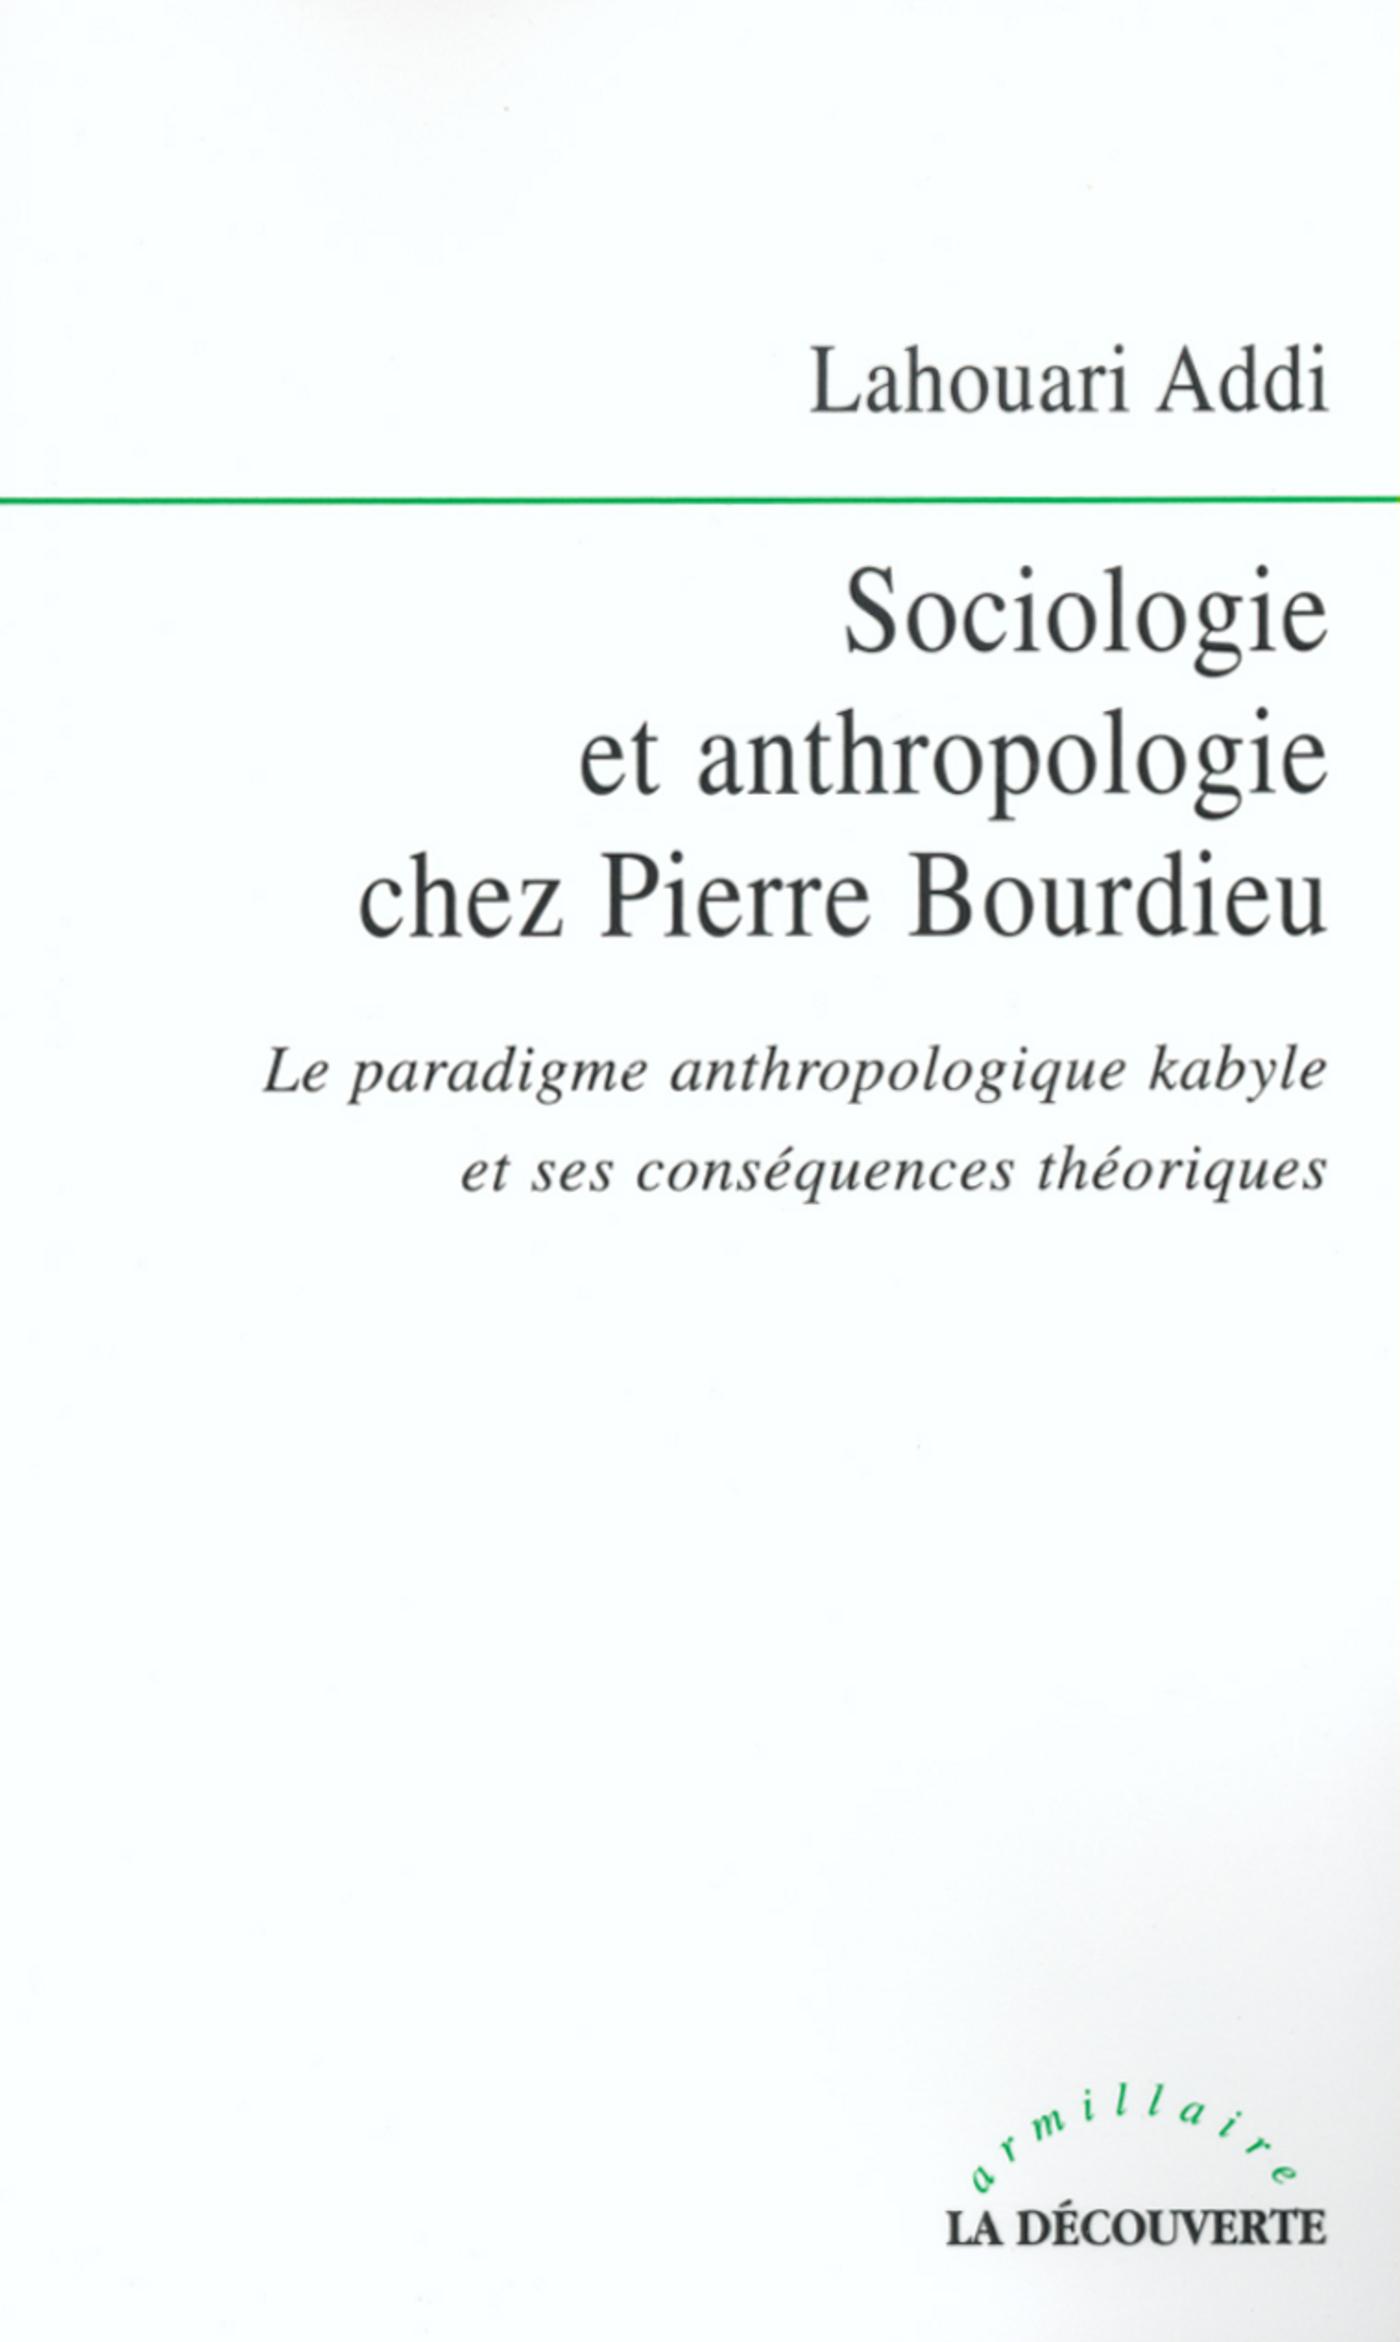 Sociologie et anthropologie chez Pierre Bourdieu (ebook)